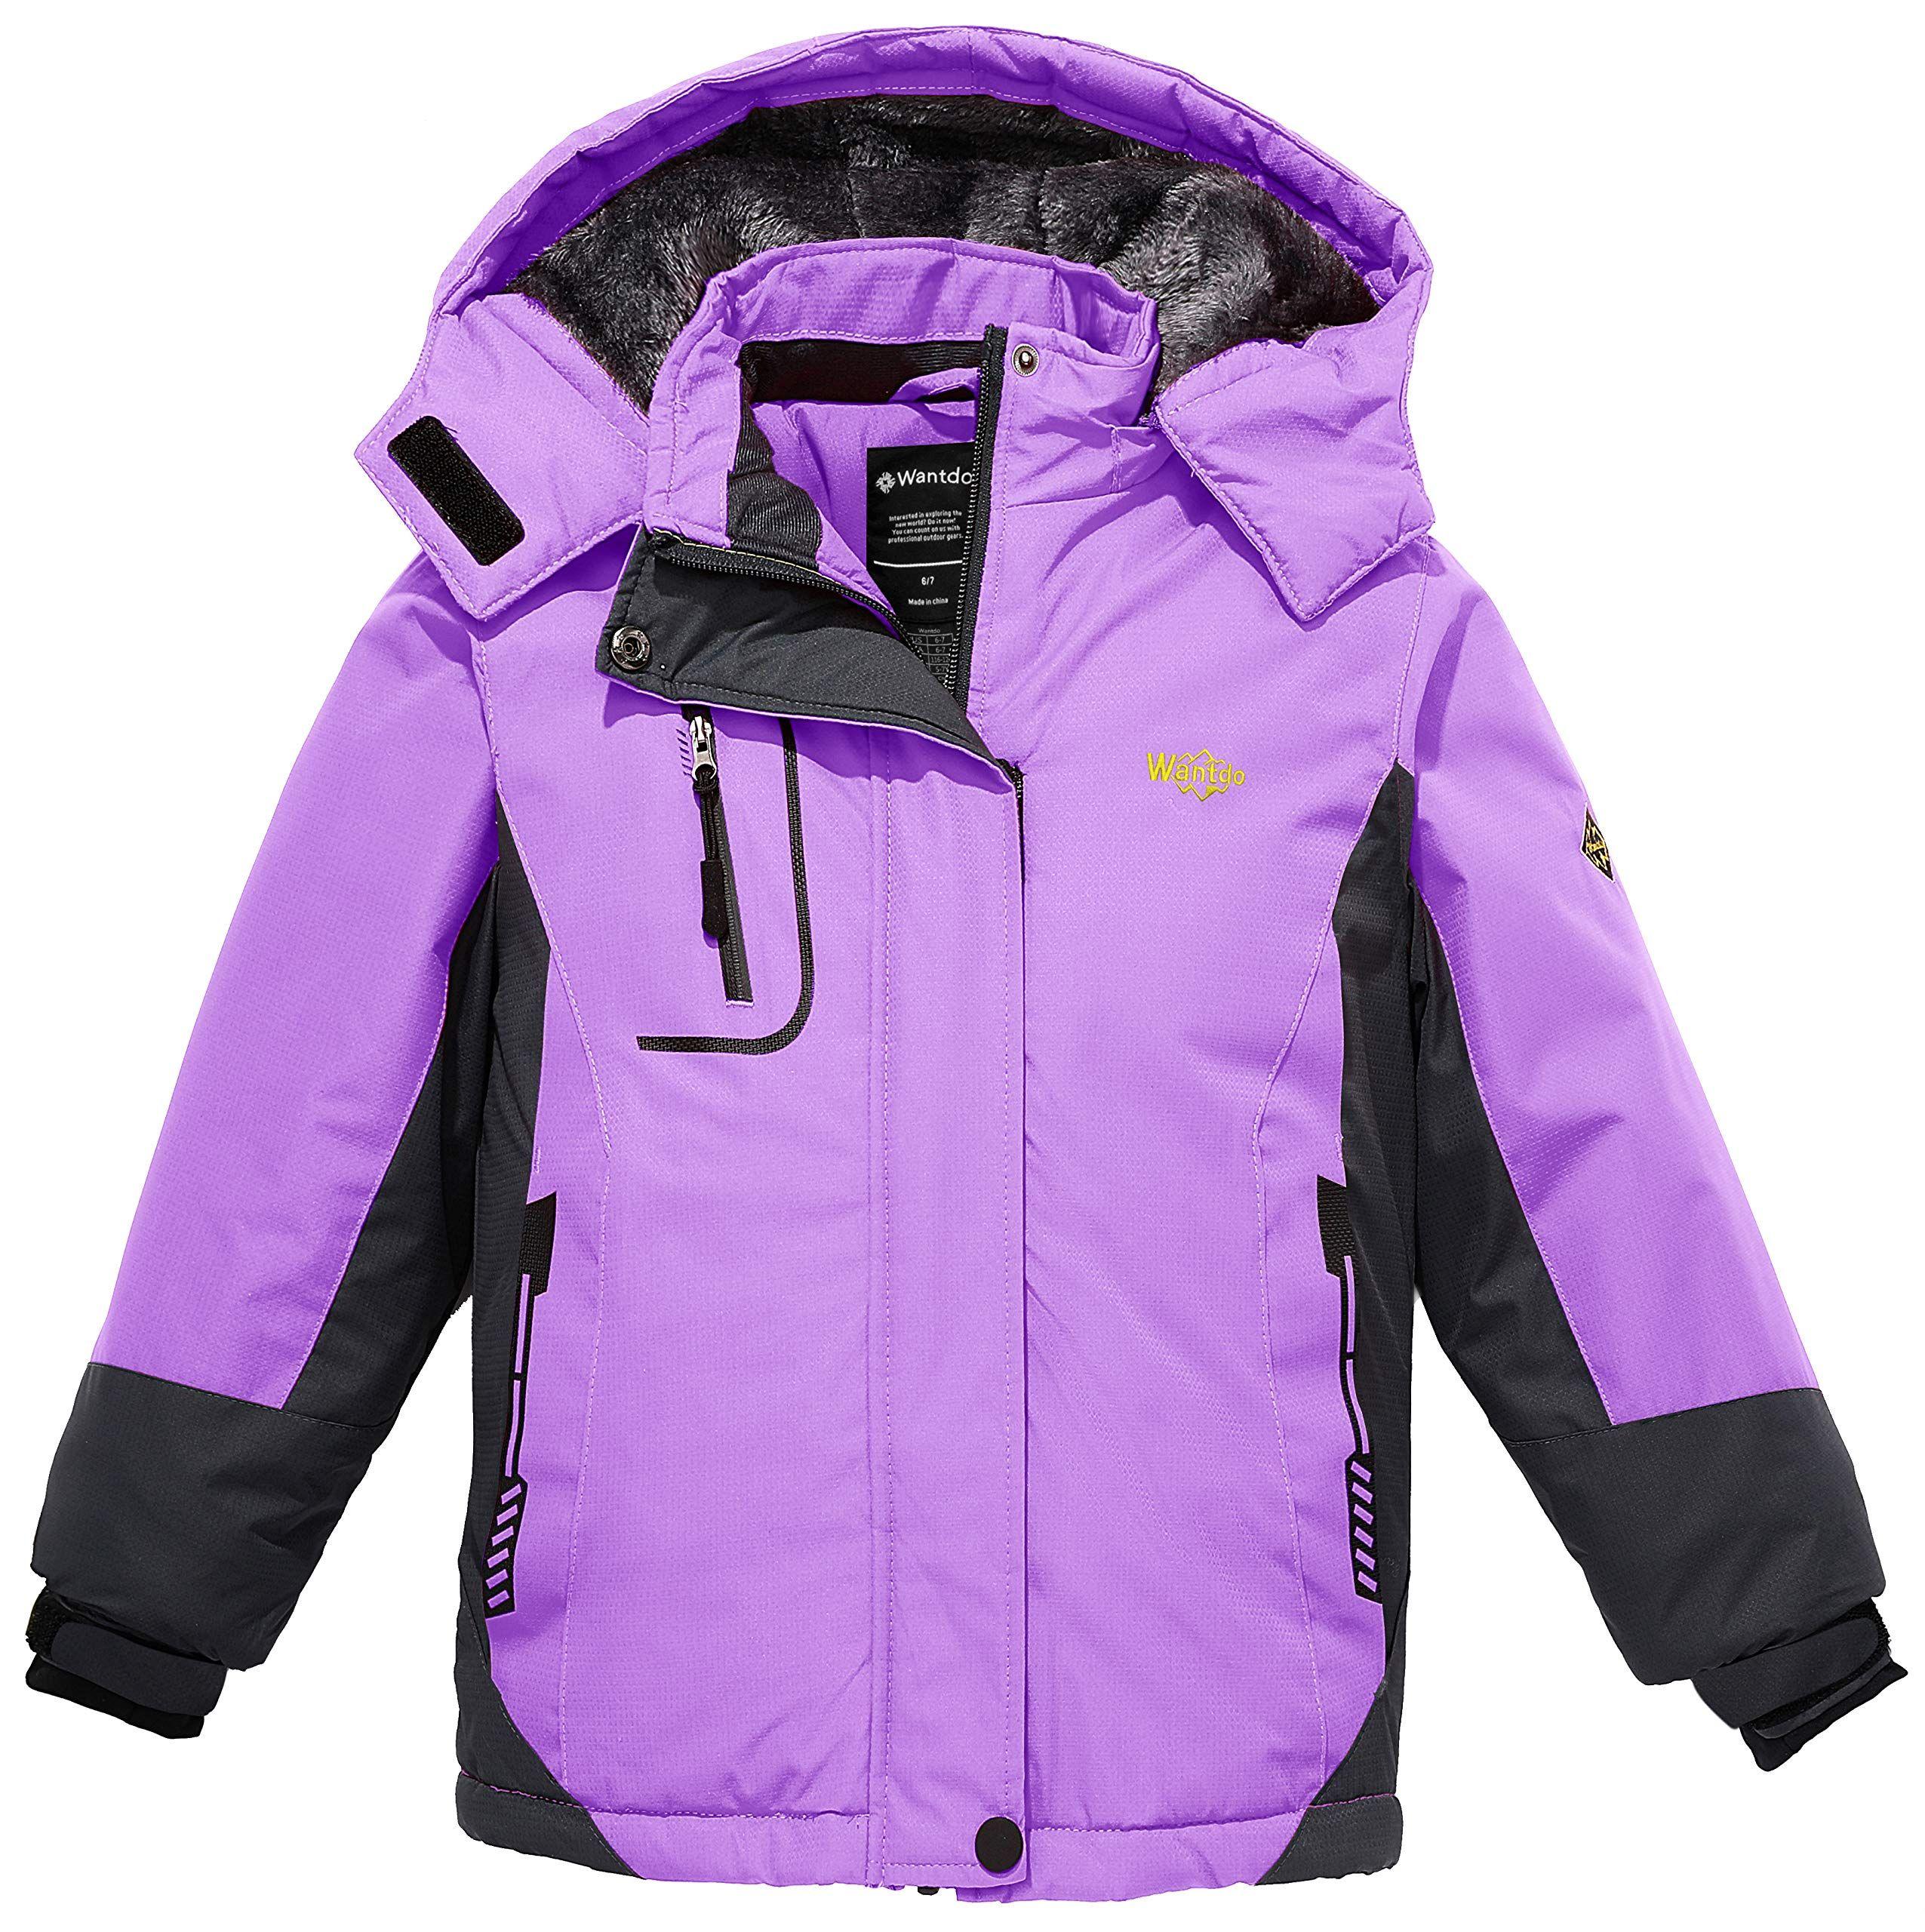 Pin By Tatiana Sematch On Dlya Doma Waterproof Winter Coat Girls Winter Jackets Ski Jacket [ 2560 x 2551 Pixel ]